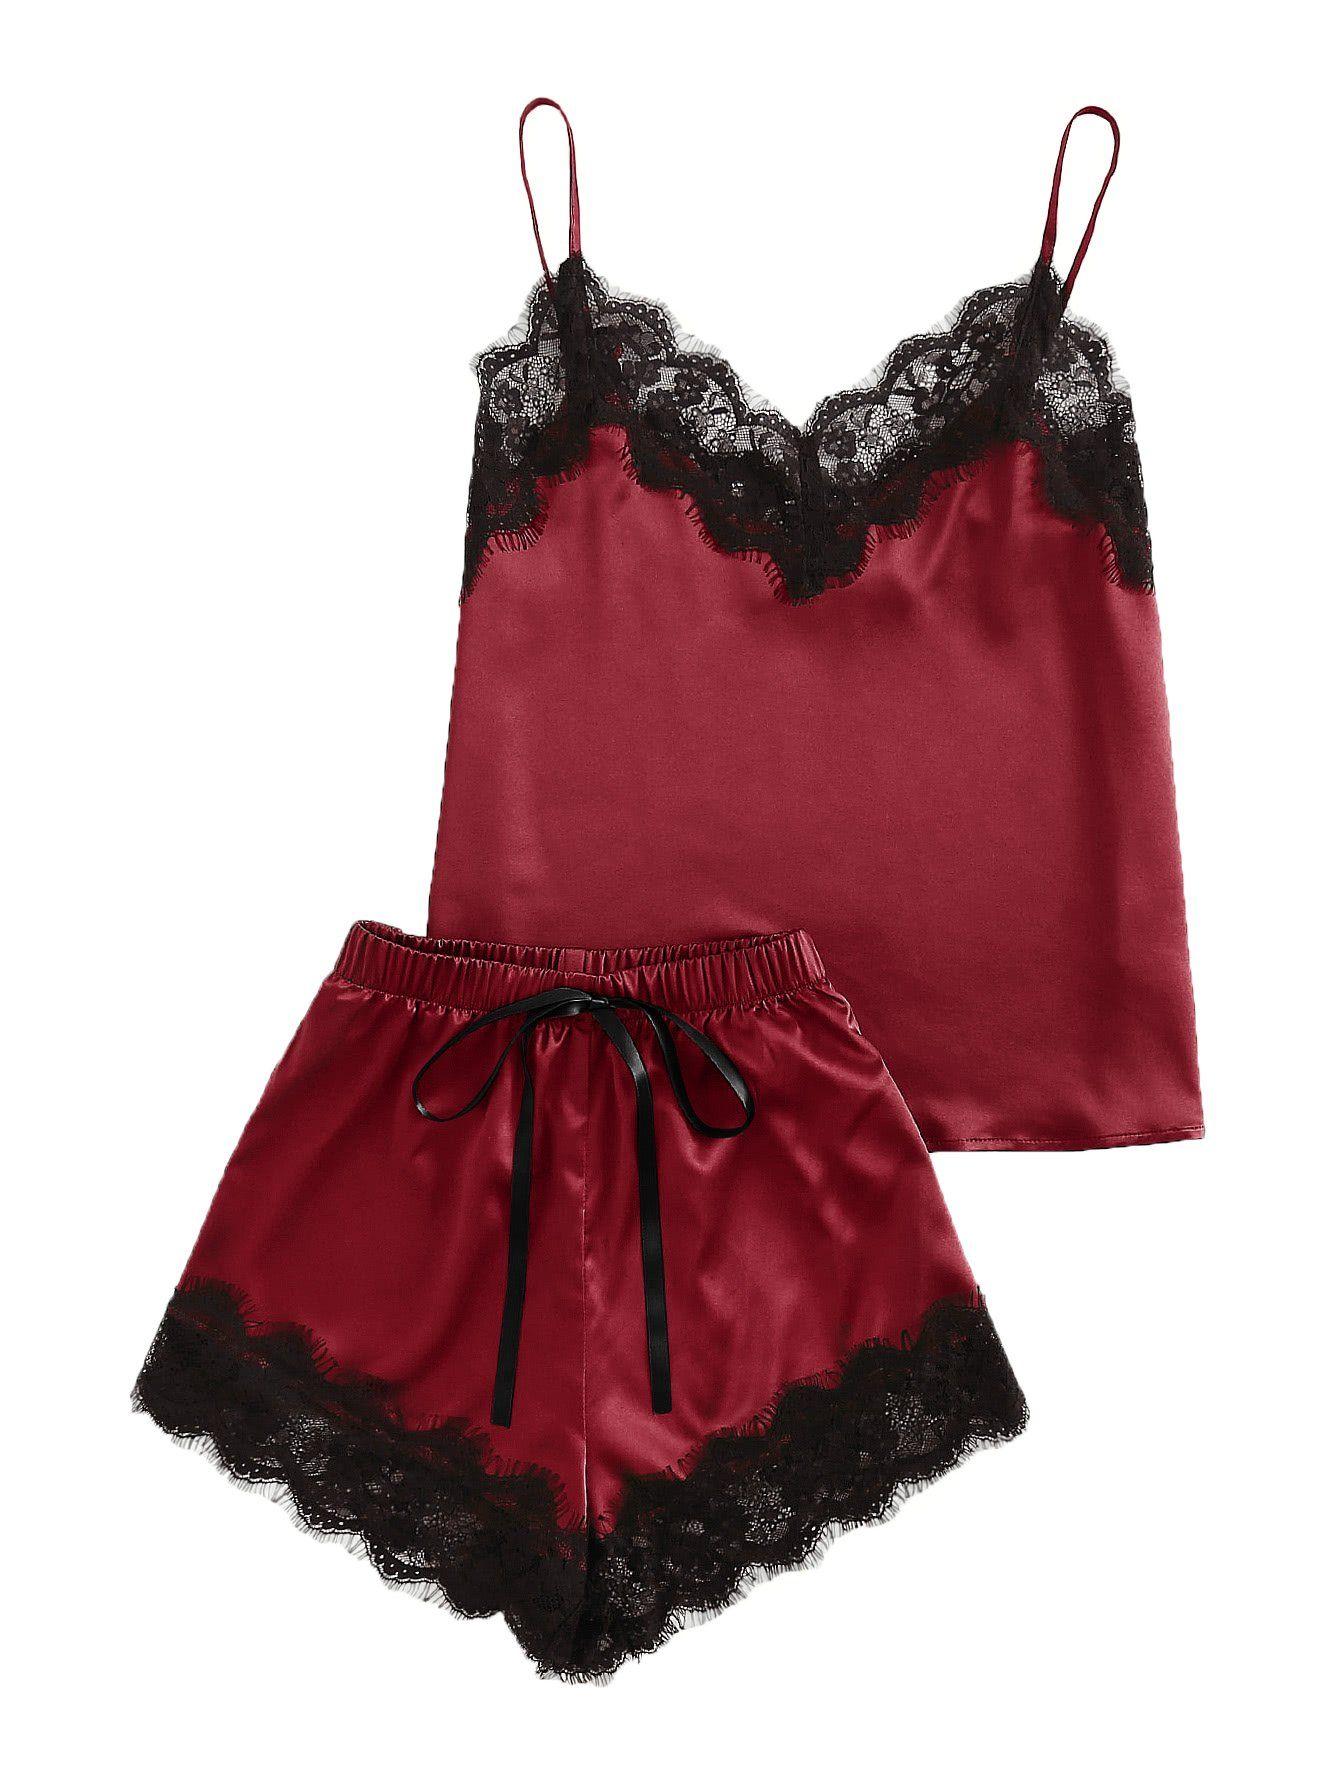 Makemechic Women S Lace Satin Sleepwear Cami Top And Shorts Pajama